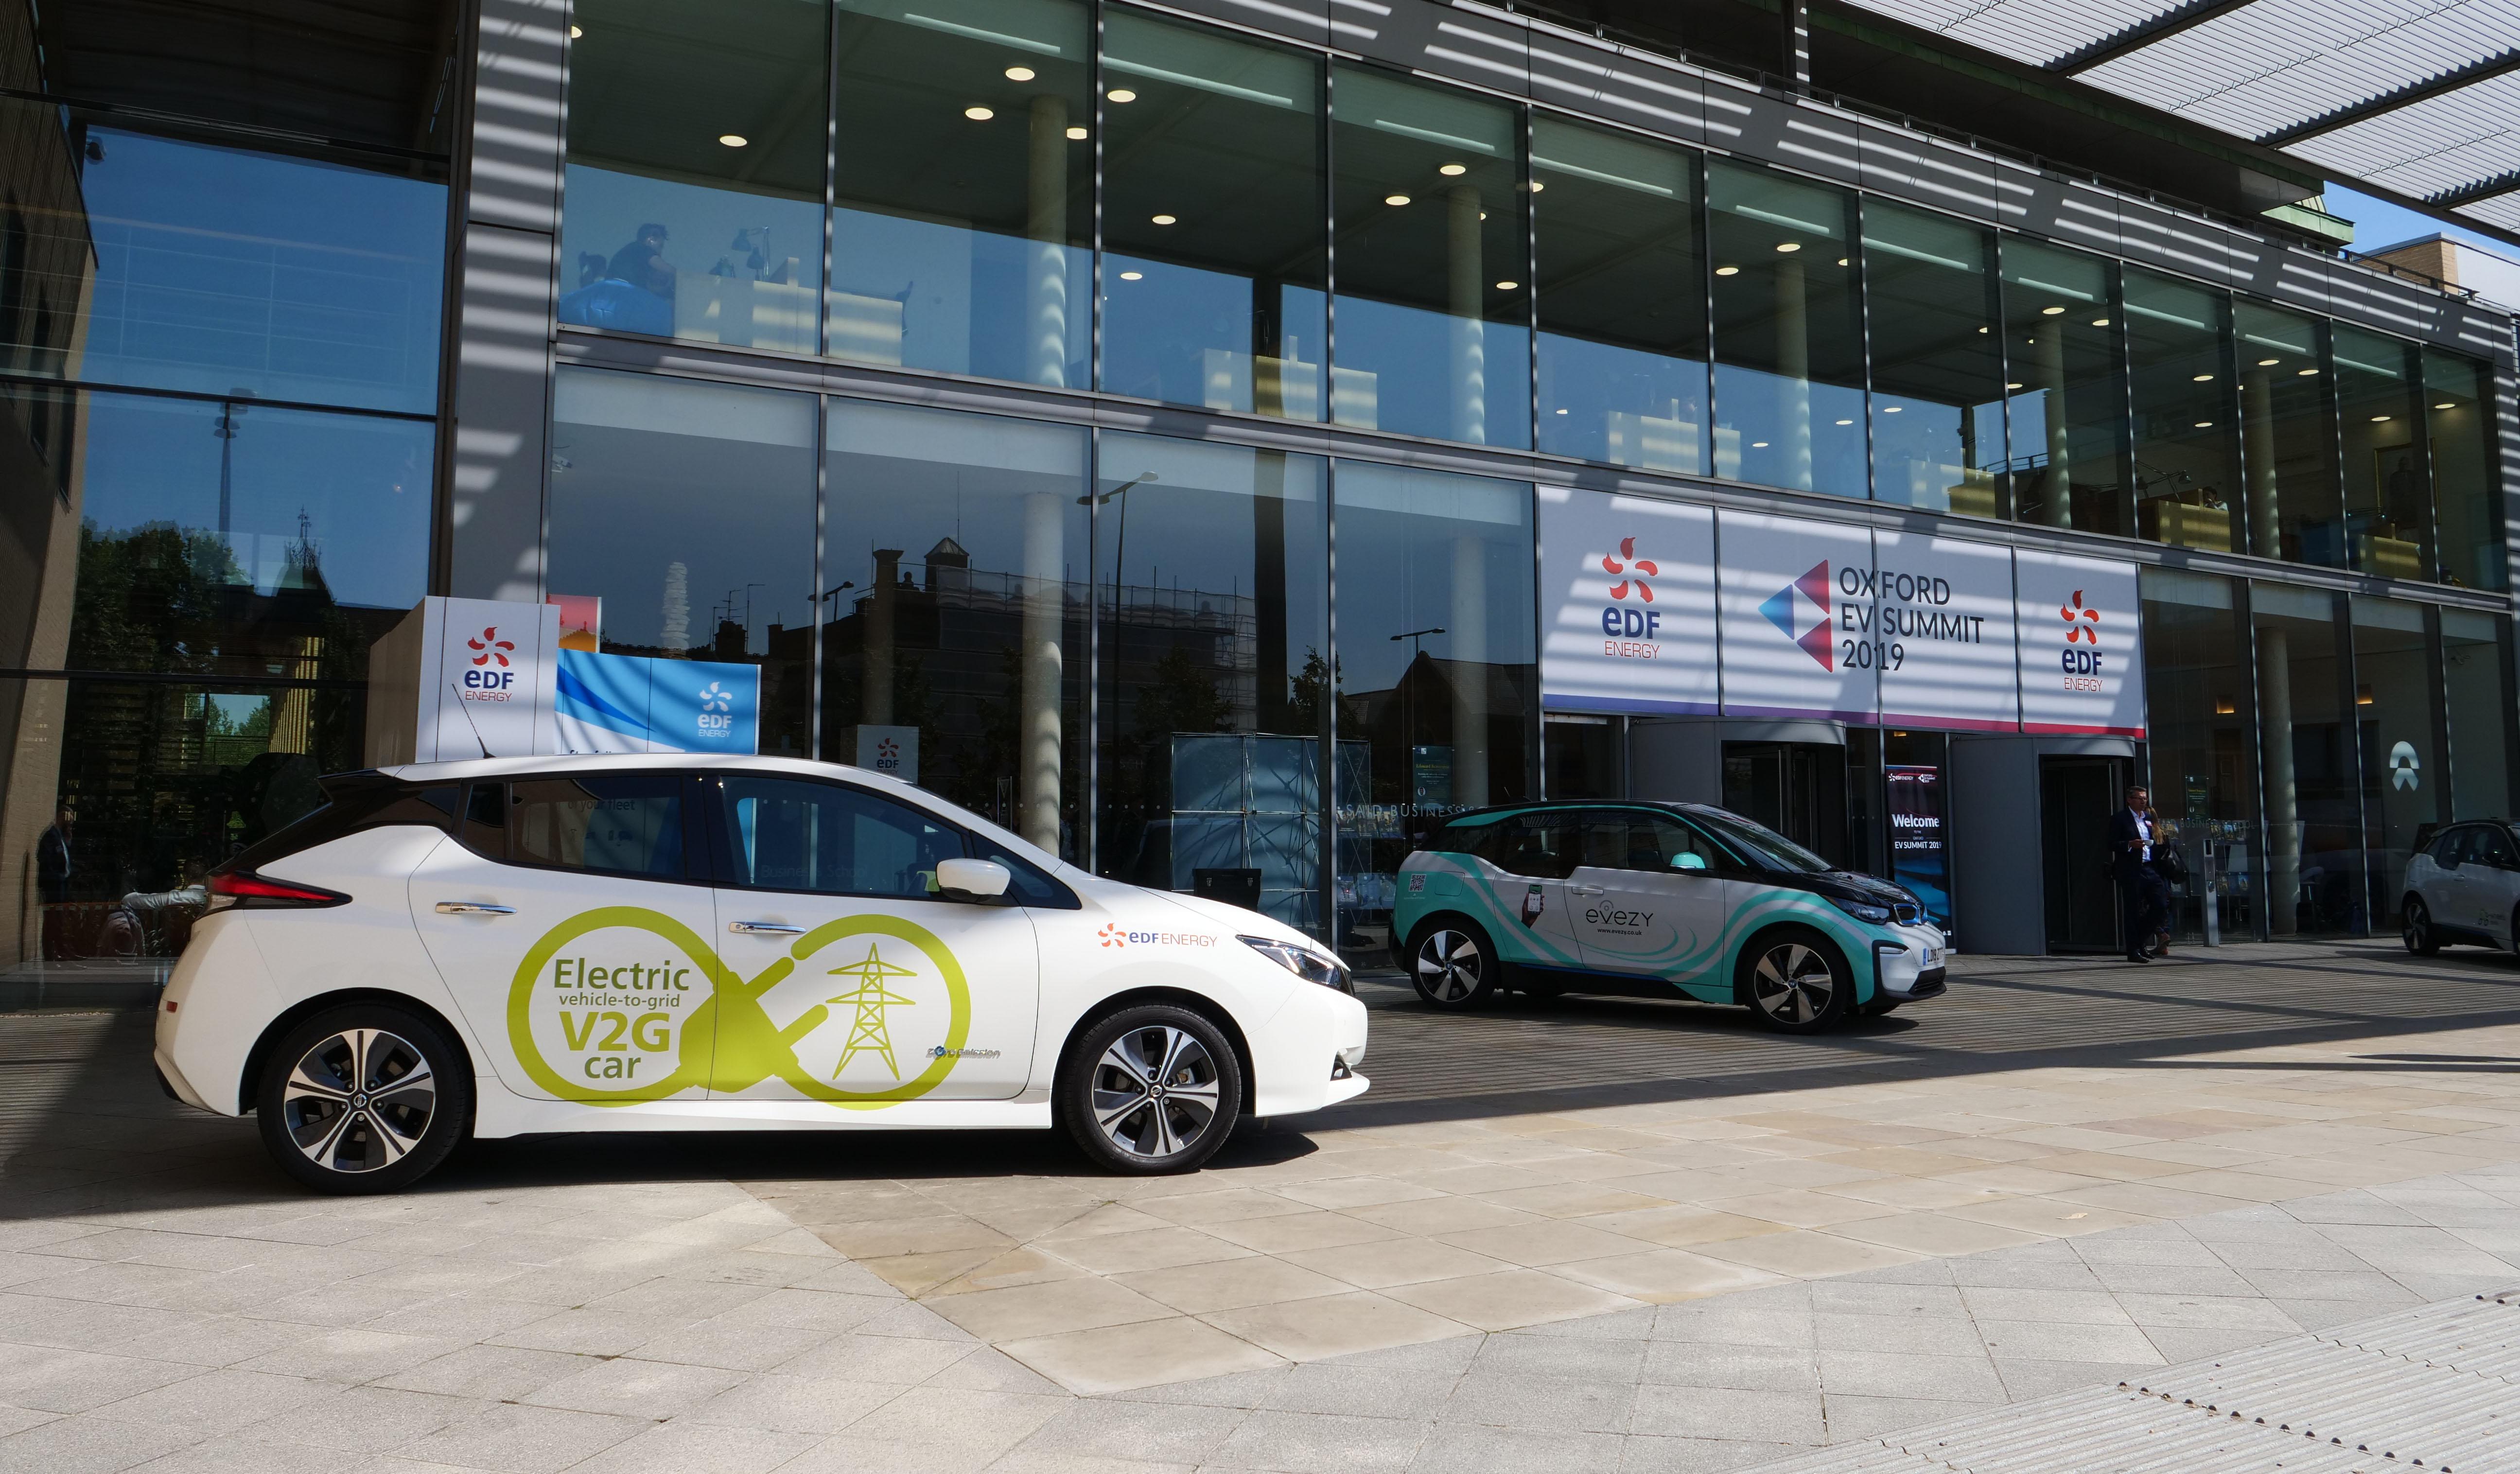 EDF Energy's Vehicle to Grid (V2G) car on show.